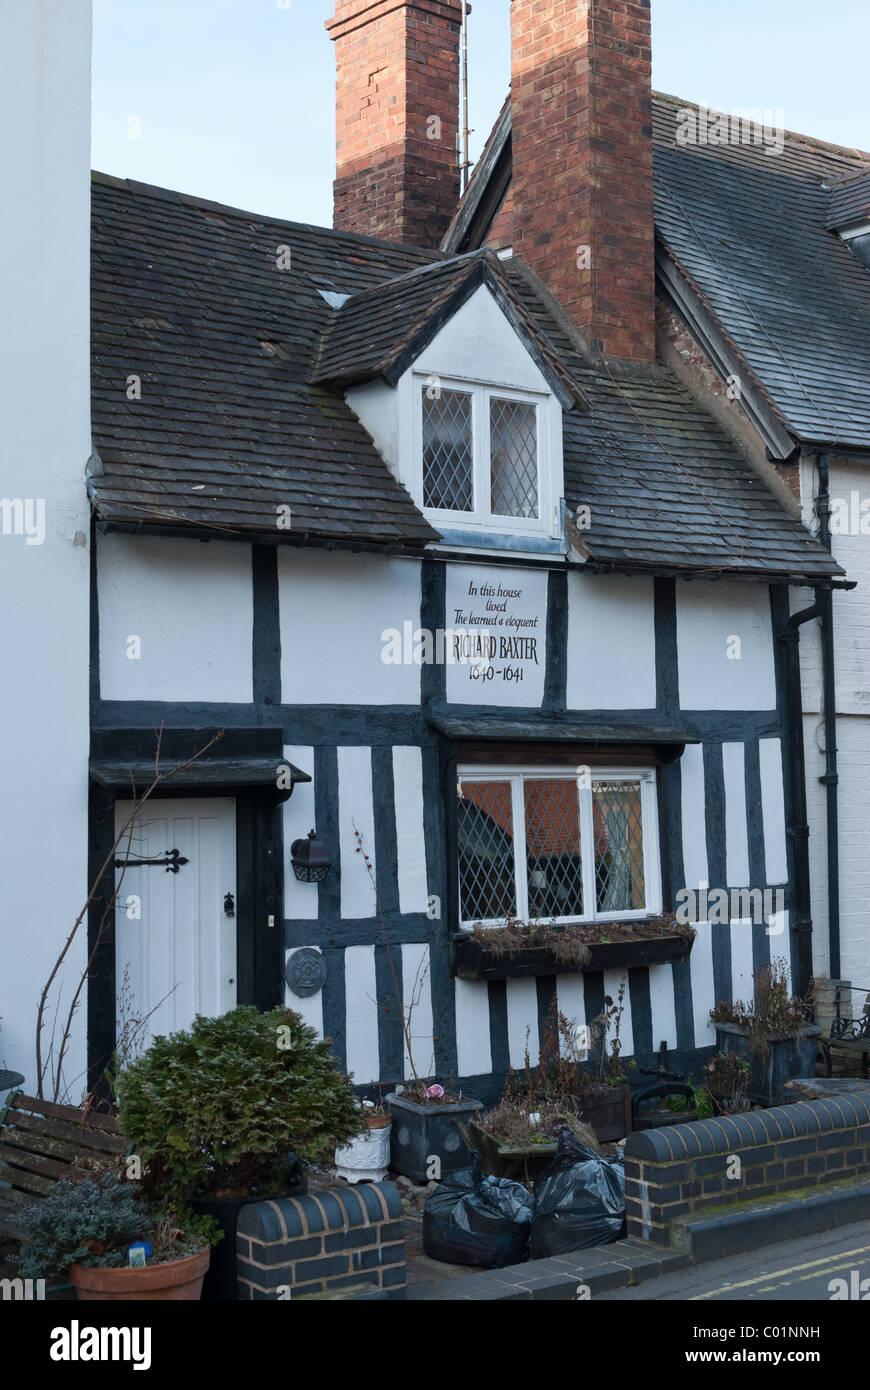 Richard Baxter's House in Bridgnorth, Shropshire. - Stock Image